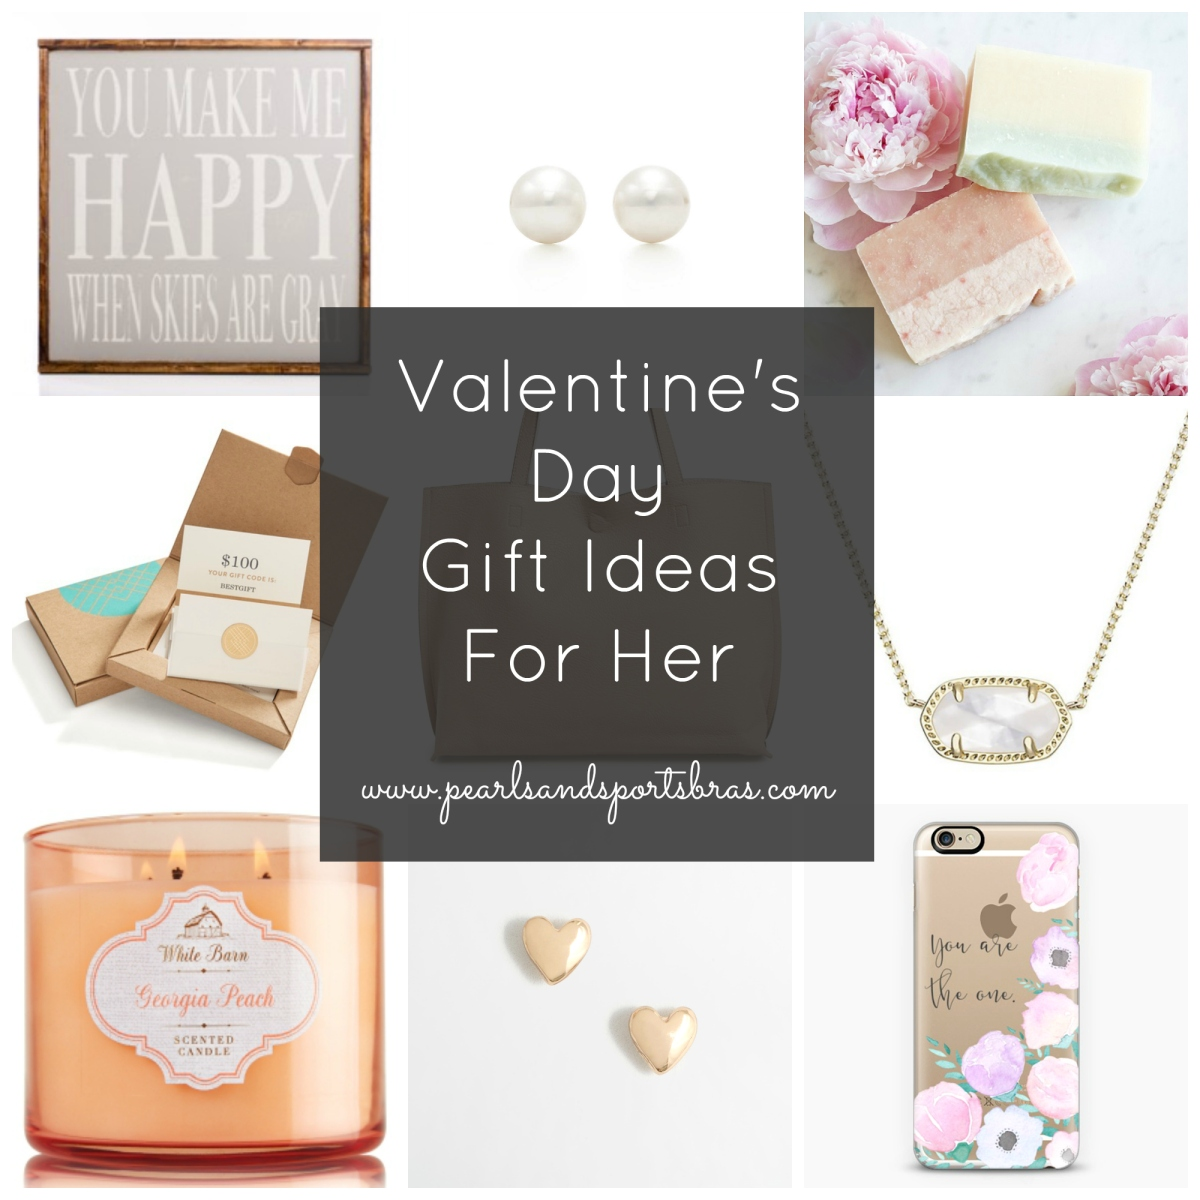 Valentine's Day Gift Ideas For Her  www.pearlsandsportsbras.com 